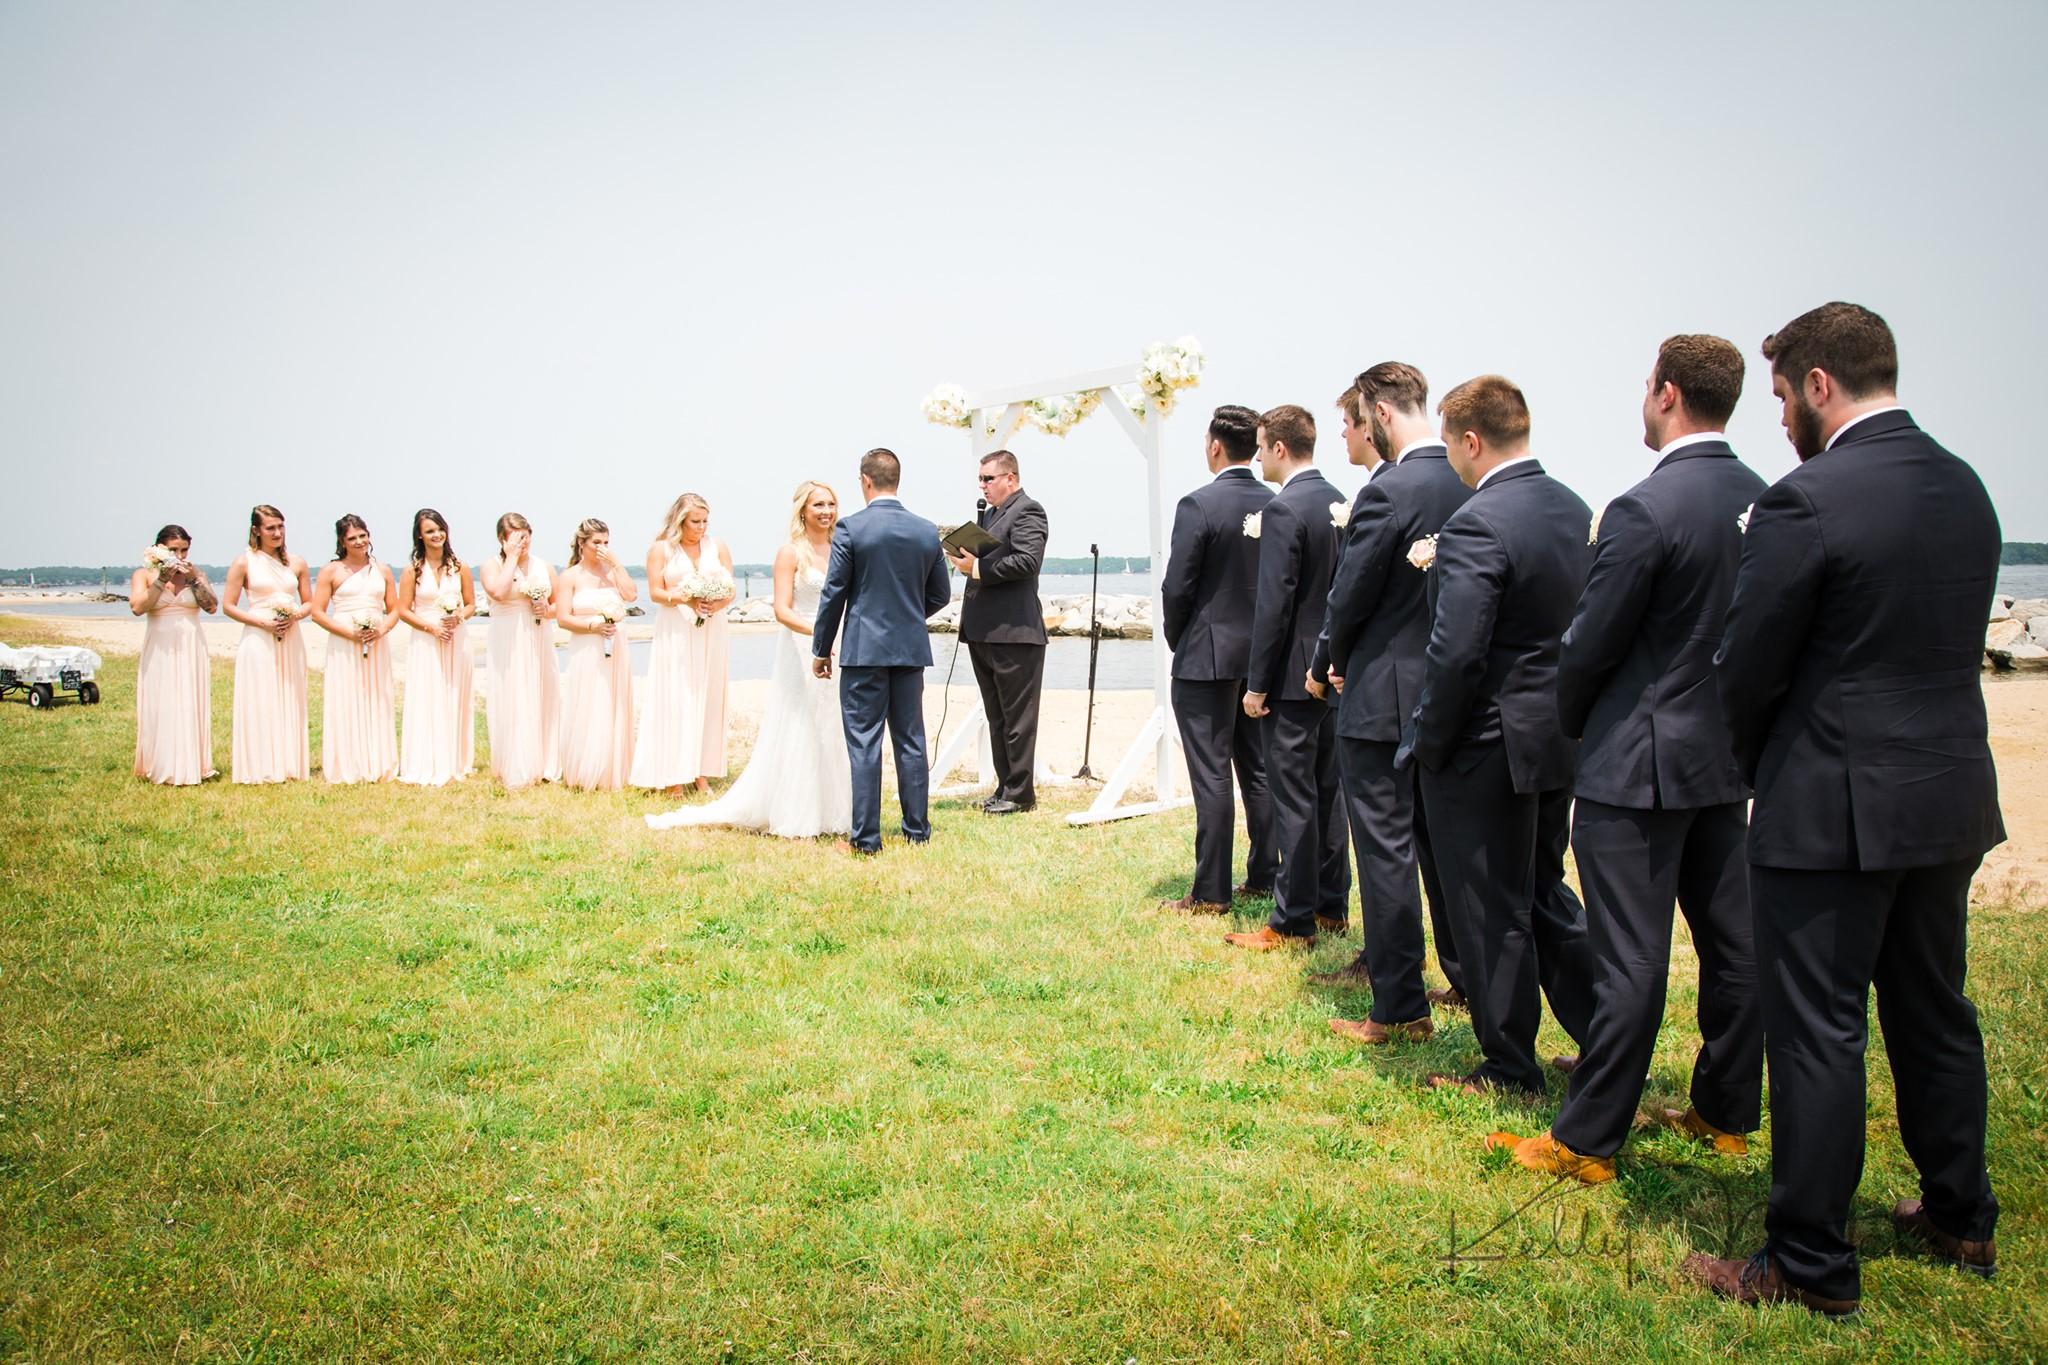 waterfront maryland wedding venue, blush bridesmaids dresses, lulus bridesmaid dress, navy blue groo